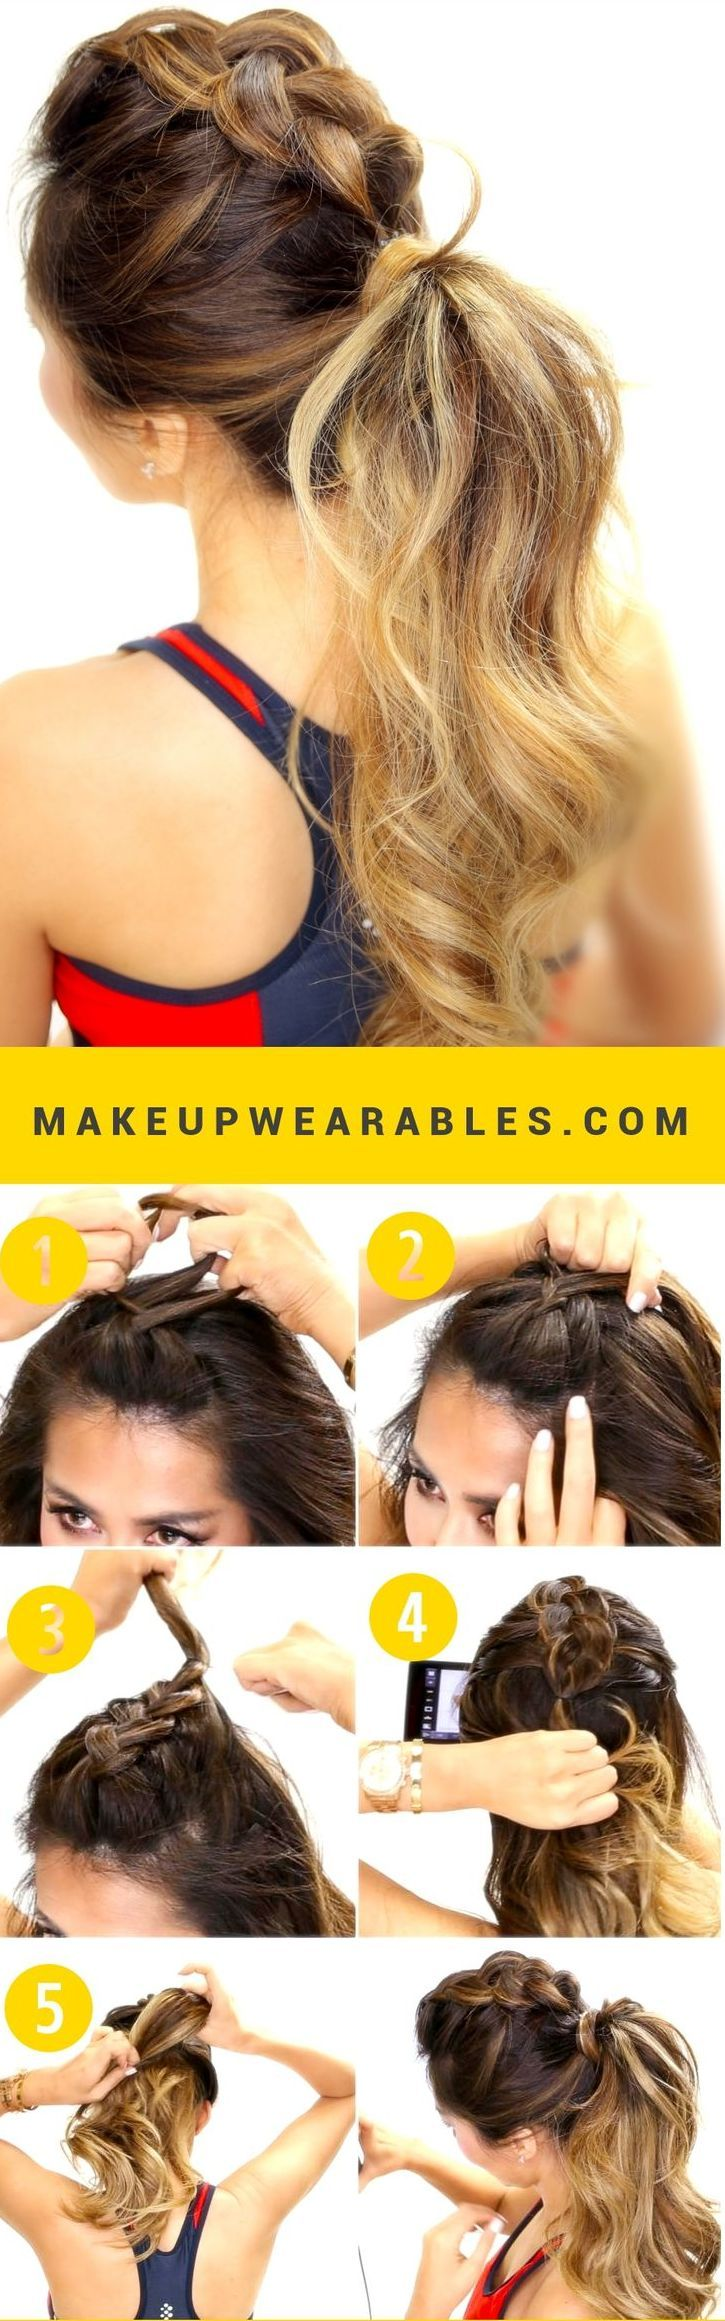 Dicasdarê blog luciane ferraes pagan braids pinterest hair